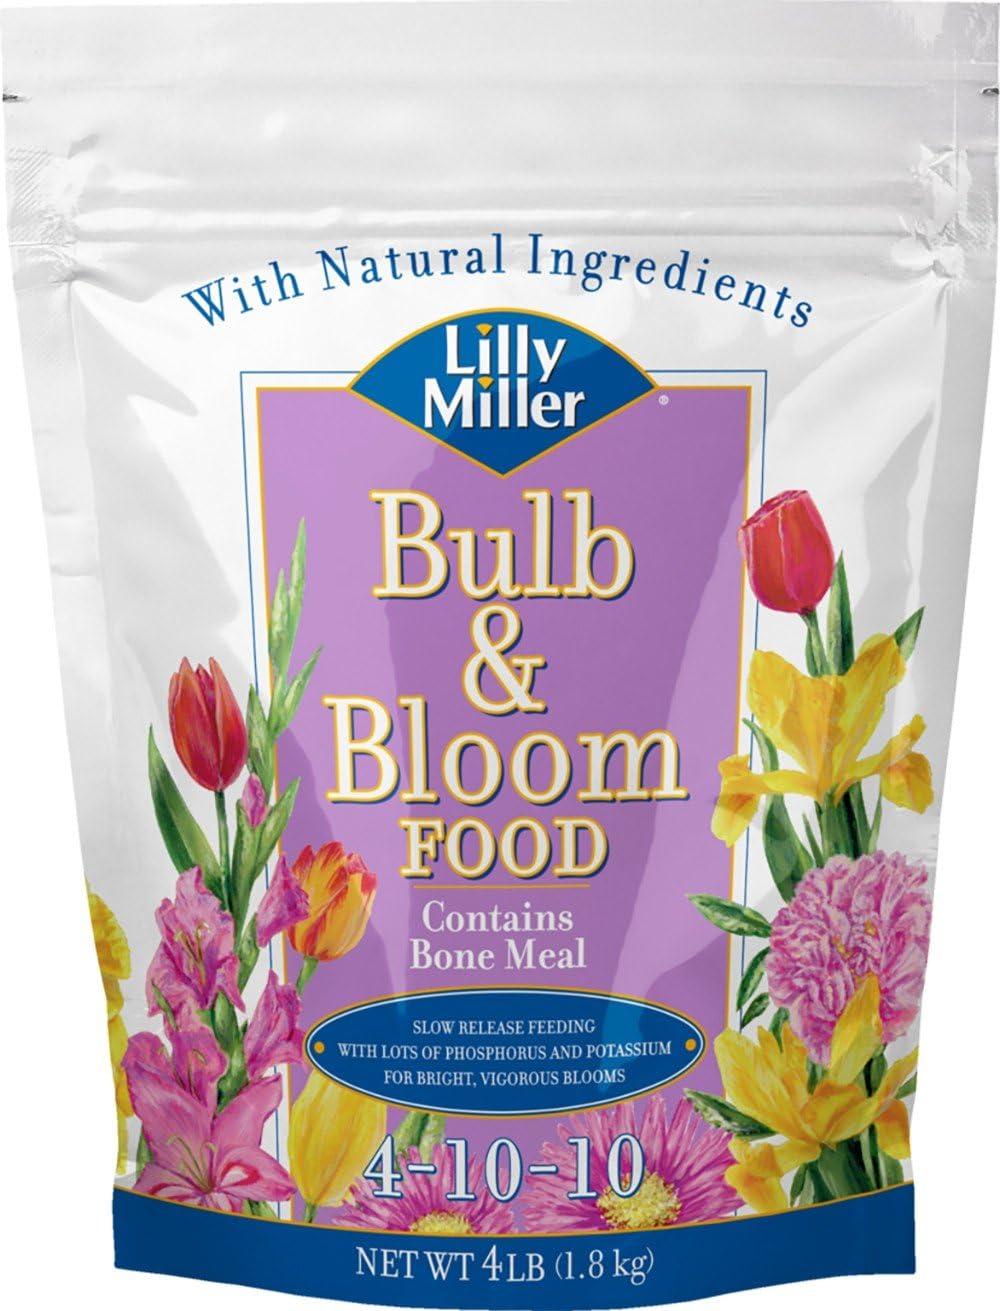 Lilly Miller Bulb & Bloom Food 4-10-10 4lb